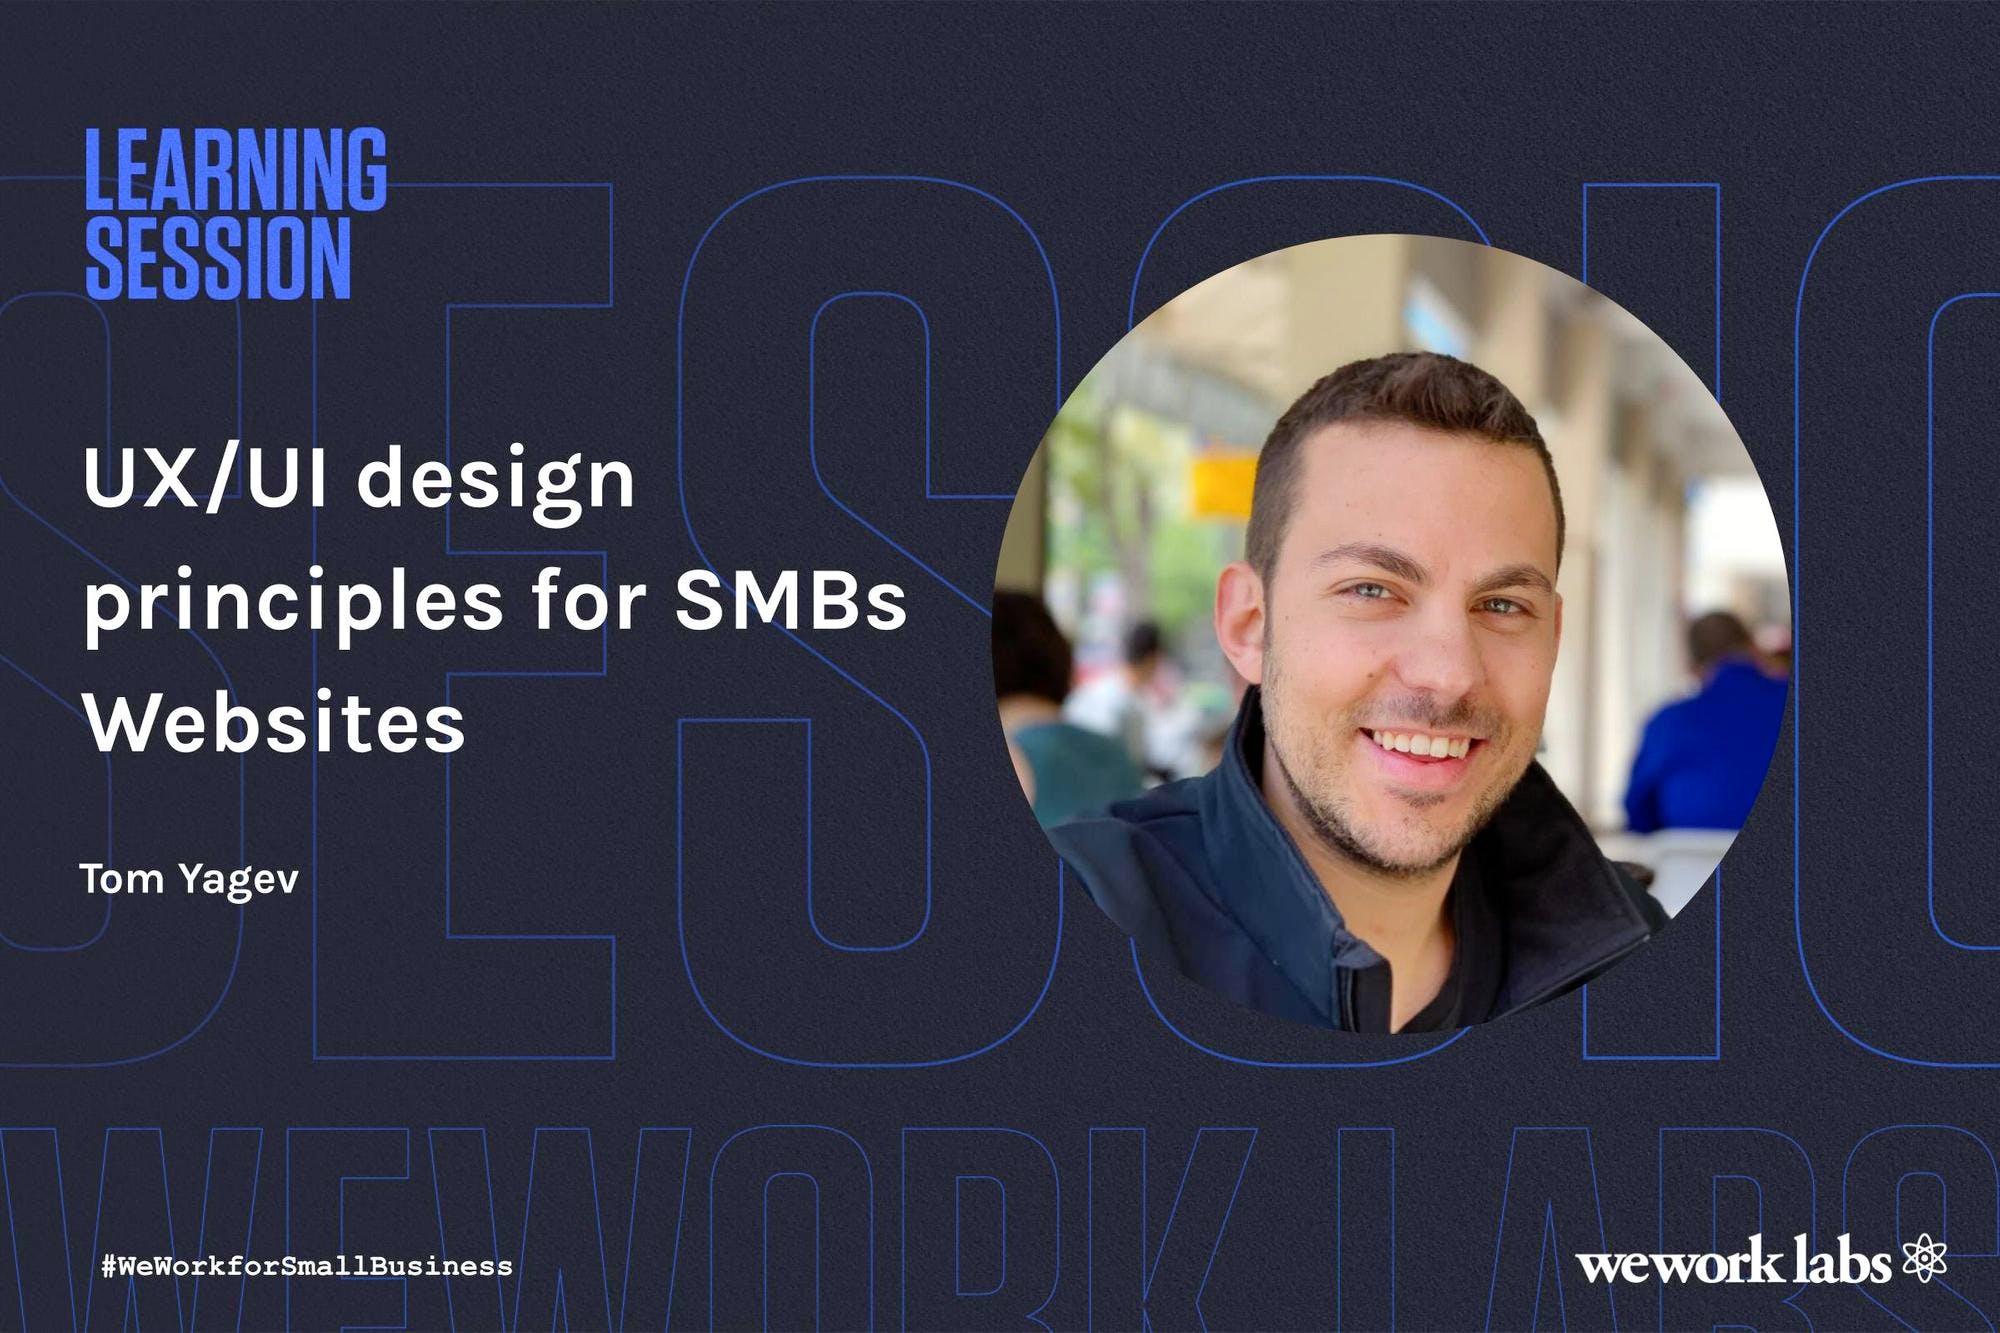 UX/UI design principles for SMBs Websites with Tom Yagev (In Hebrew)